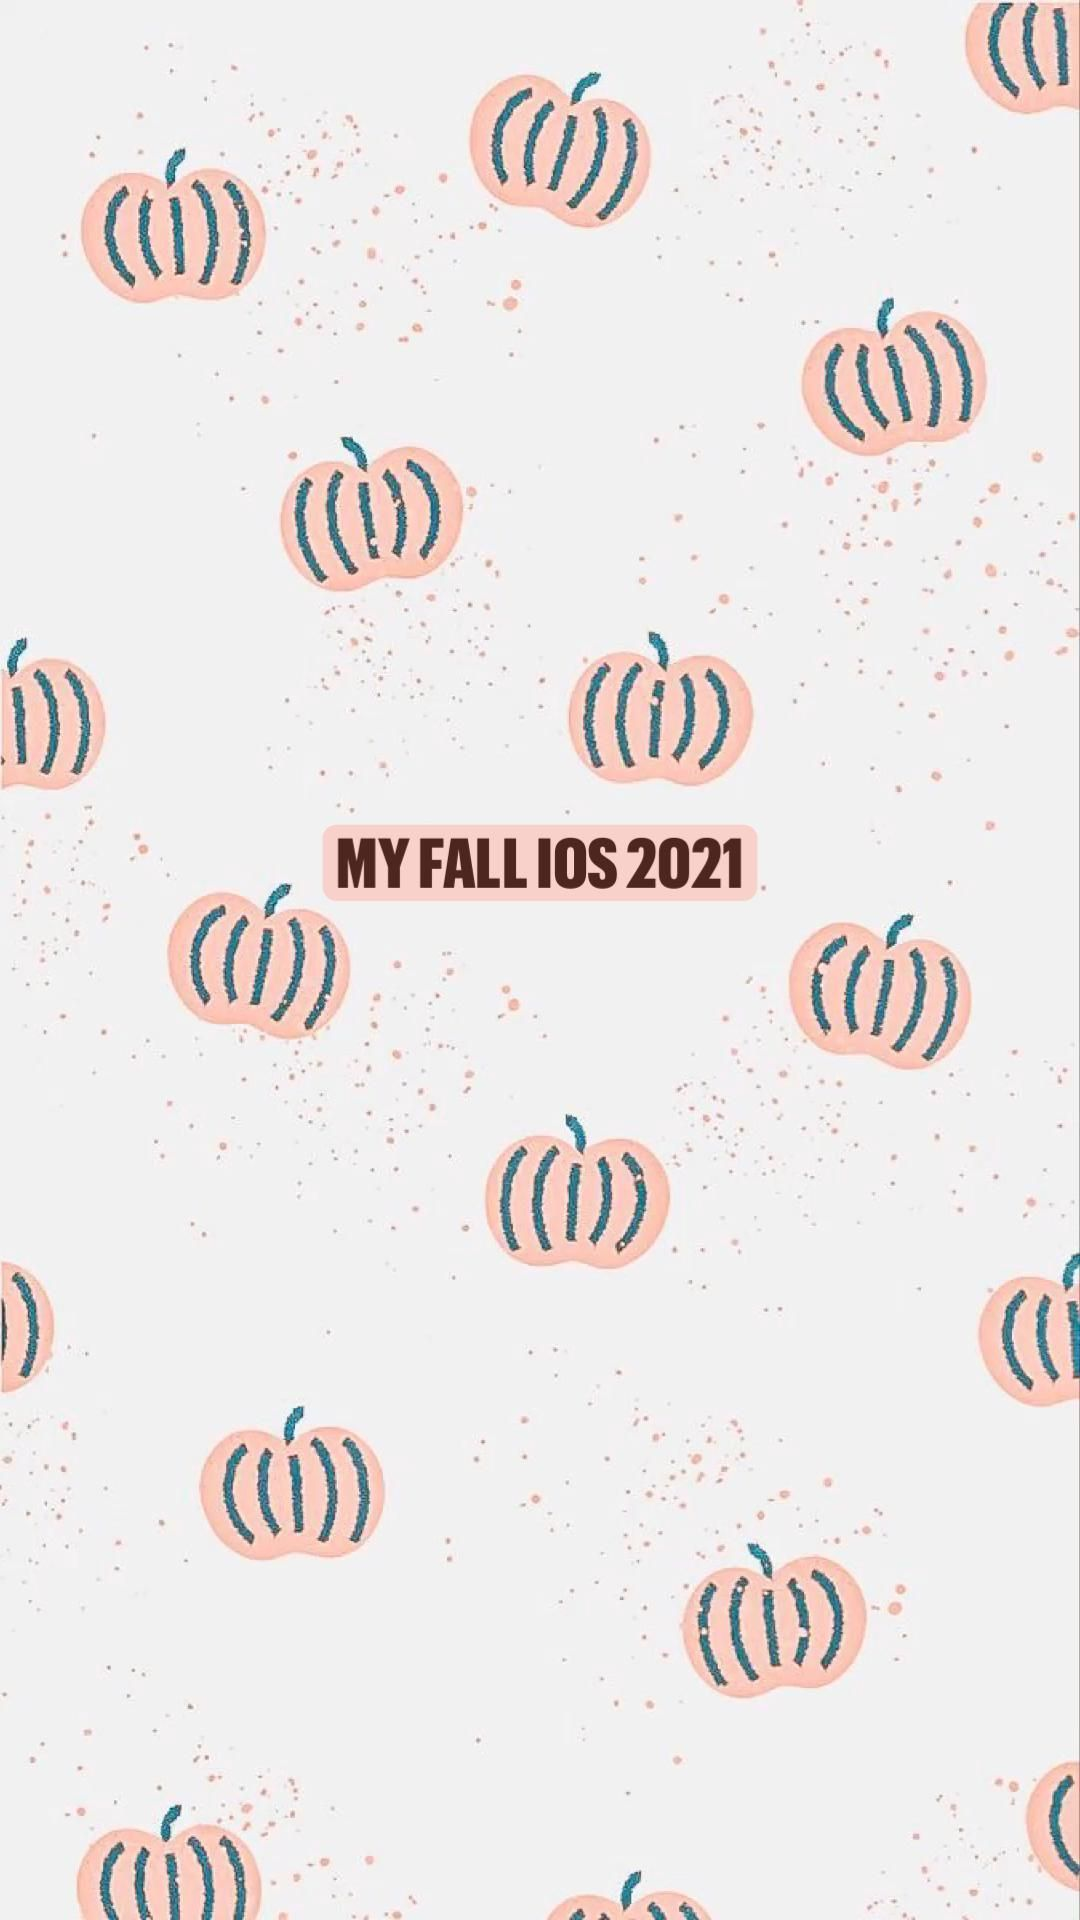 My Fall iOS 2021